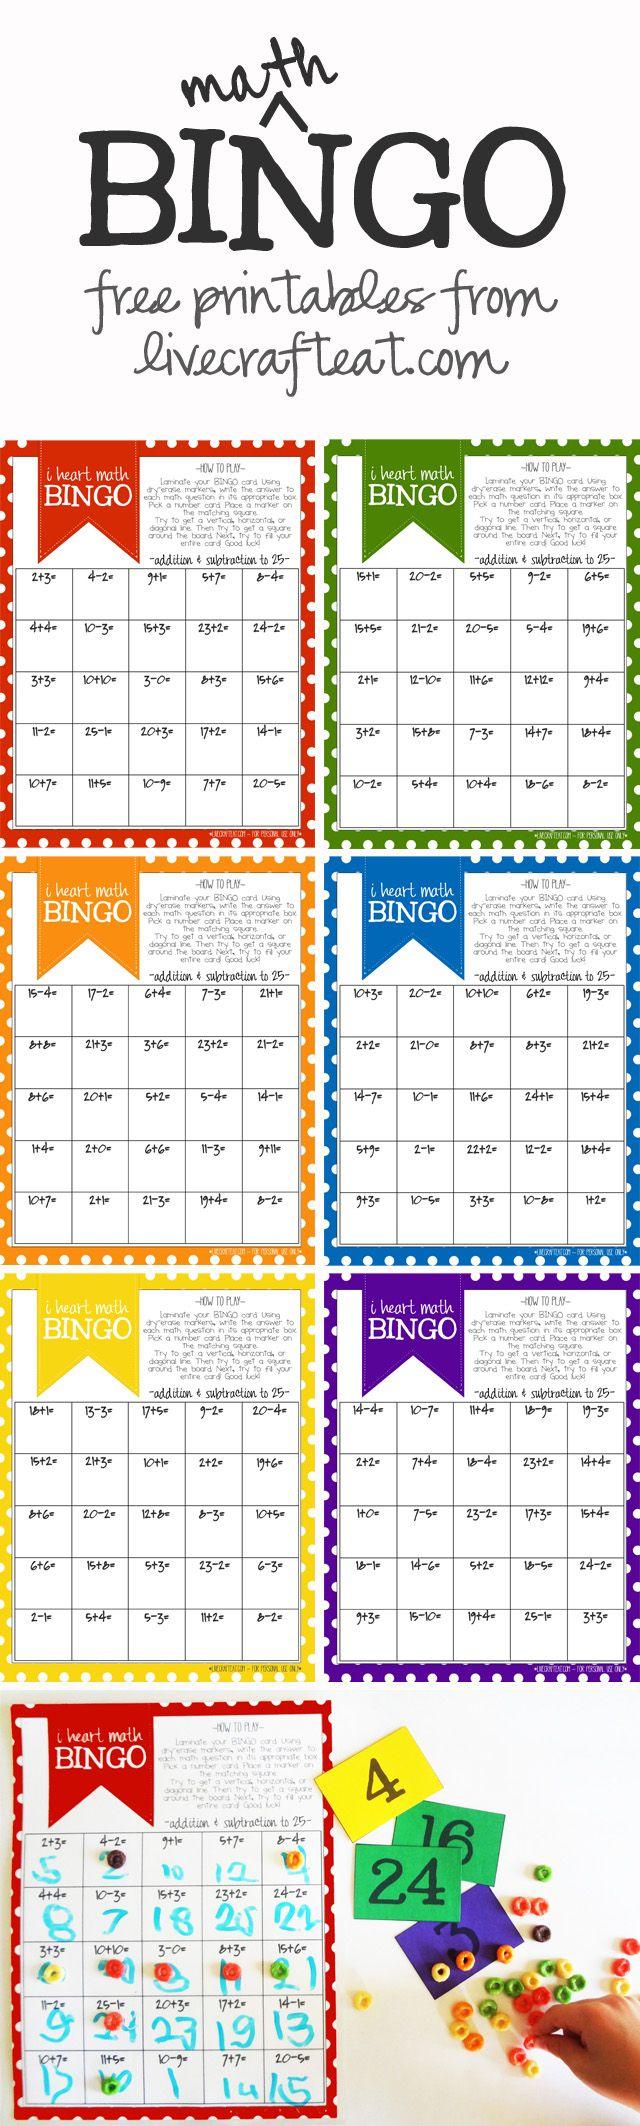 Math Bingo Printable For Kids - Free | Math Activities | Pinterest - Math Bingo Free Printable